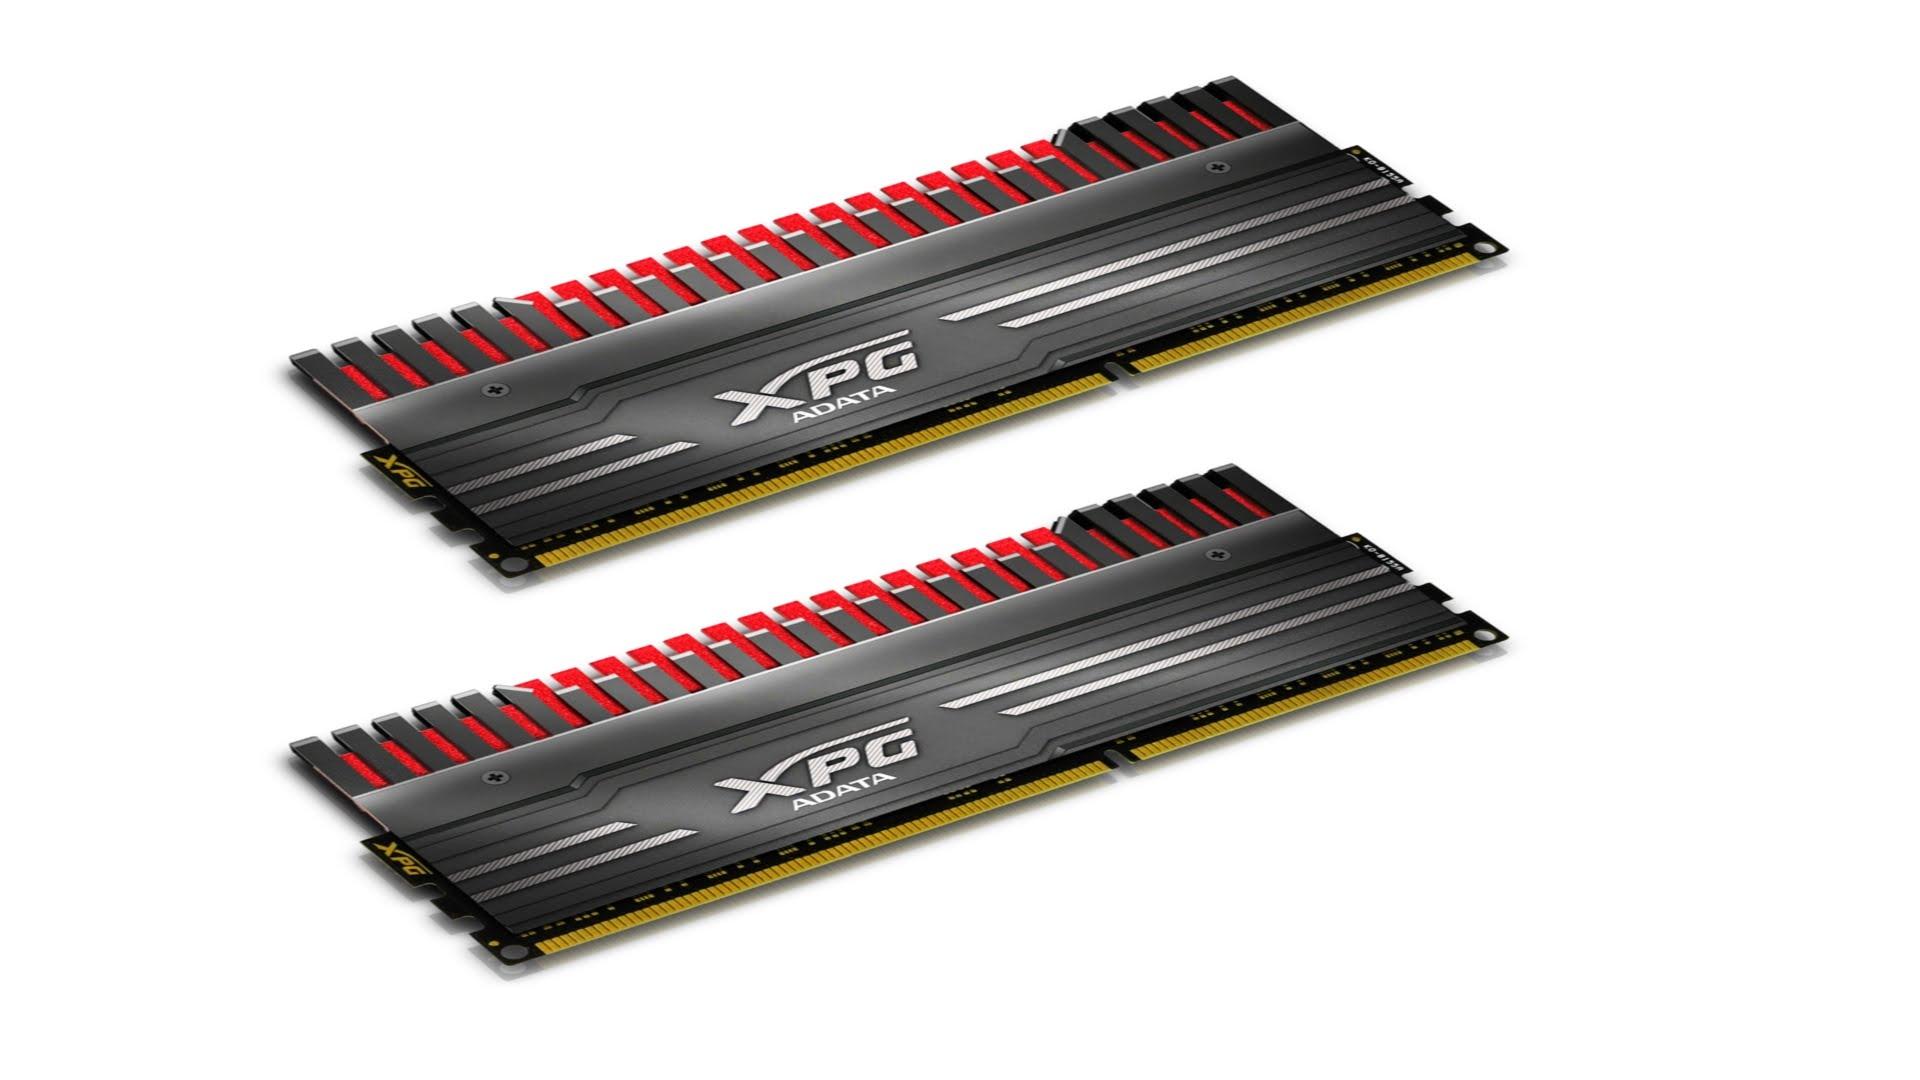 Adata XPG 2933 MHz DDR3